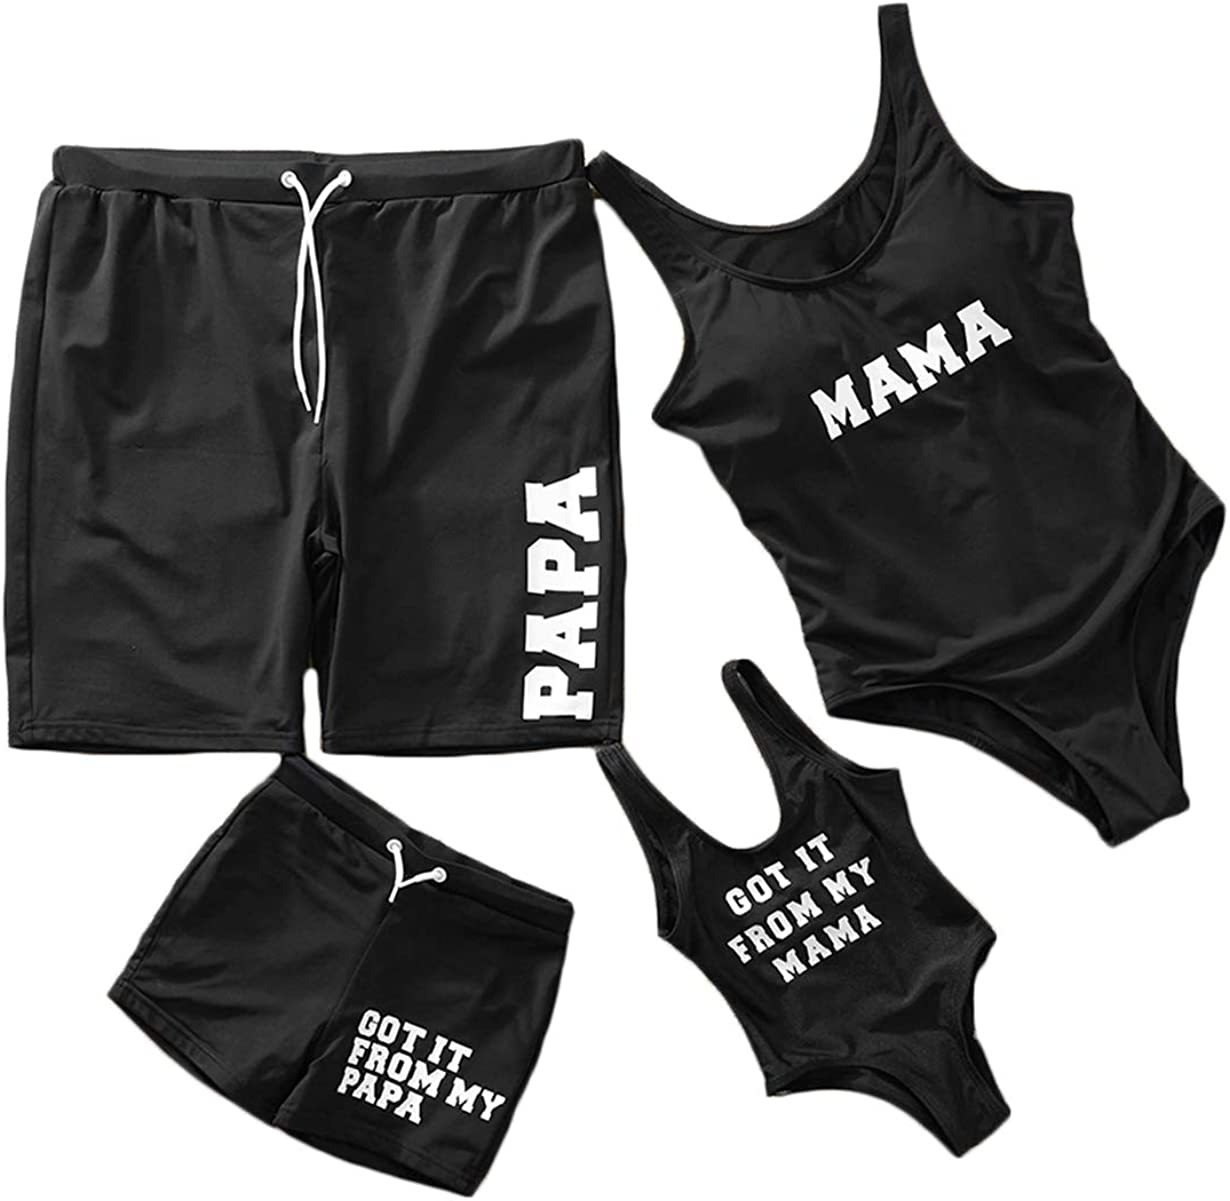 Family Matching Swimsuit Women One Piece Beach Wear Letter Printed Monokini Swimwear